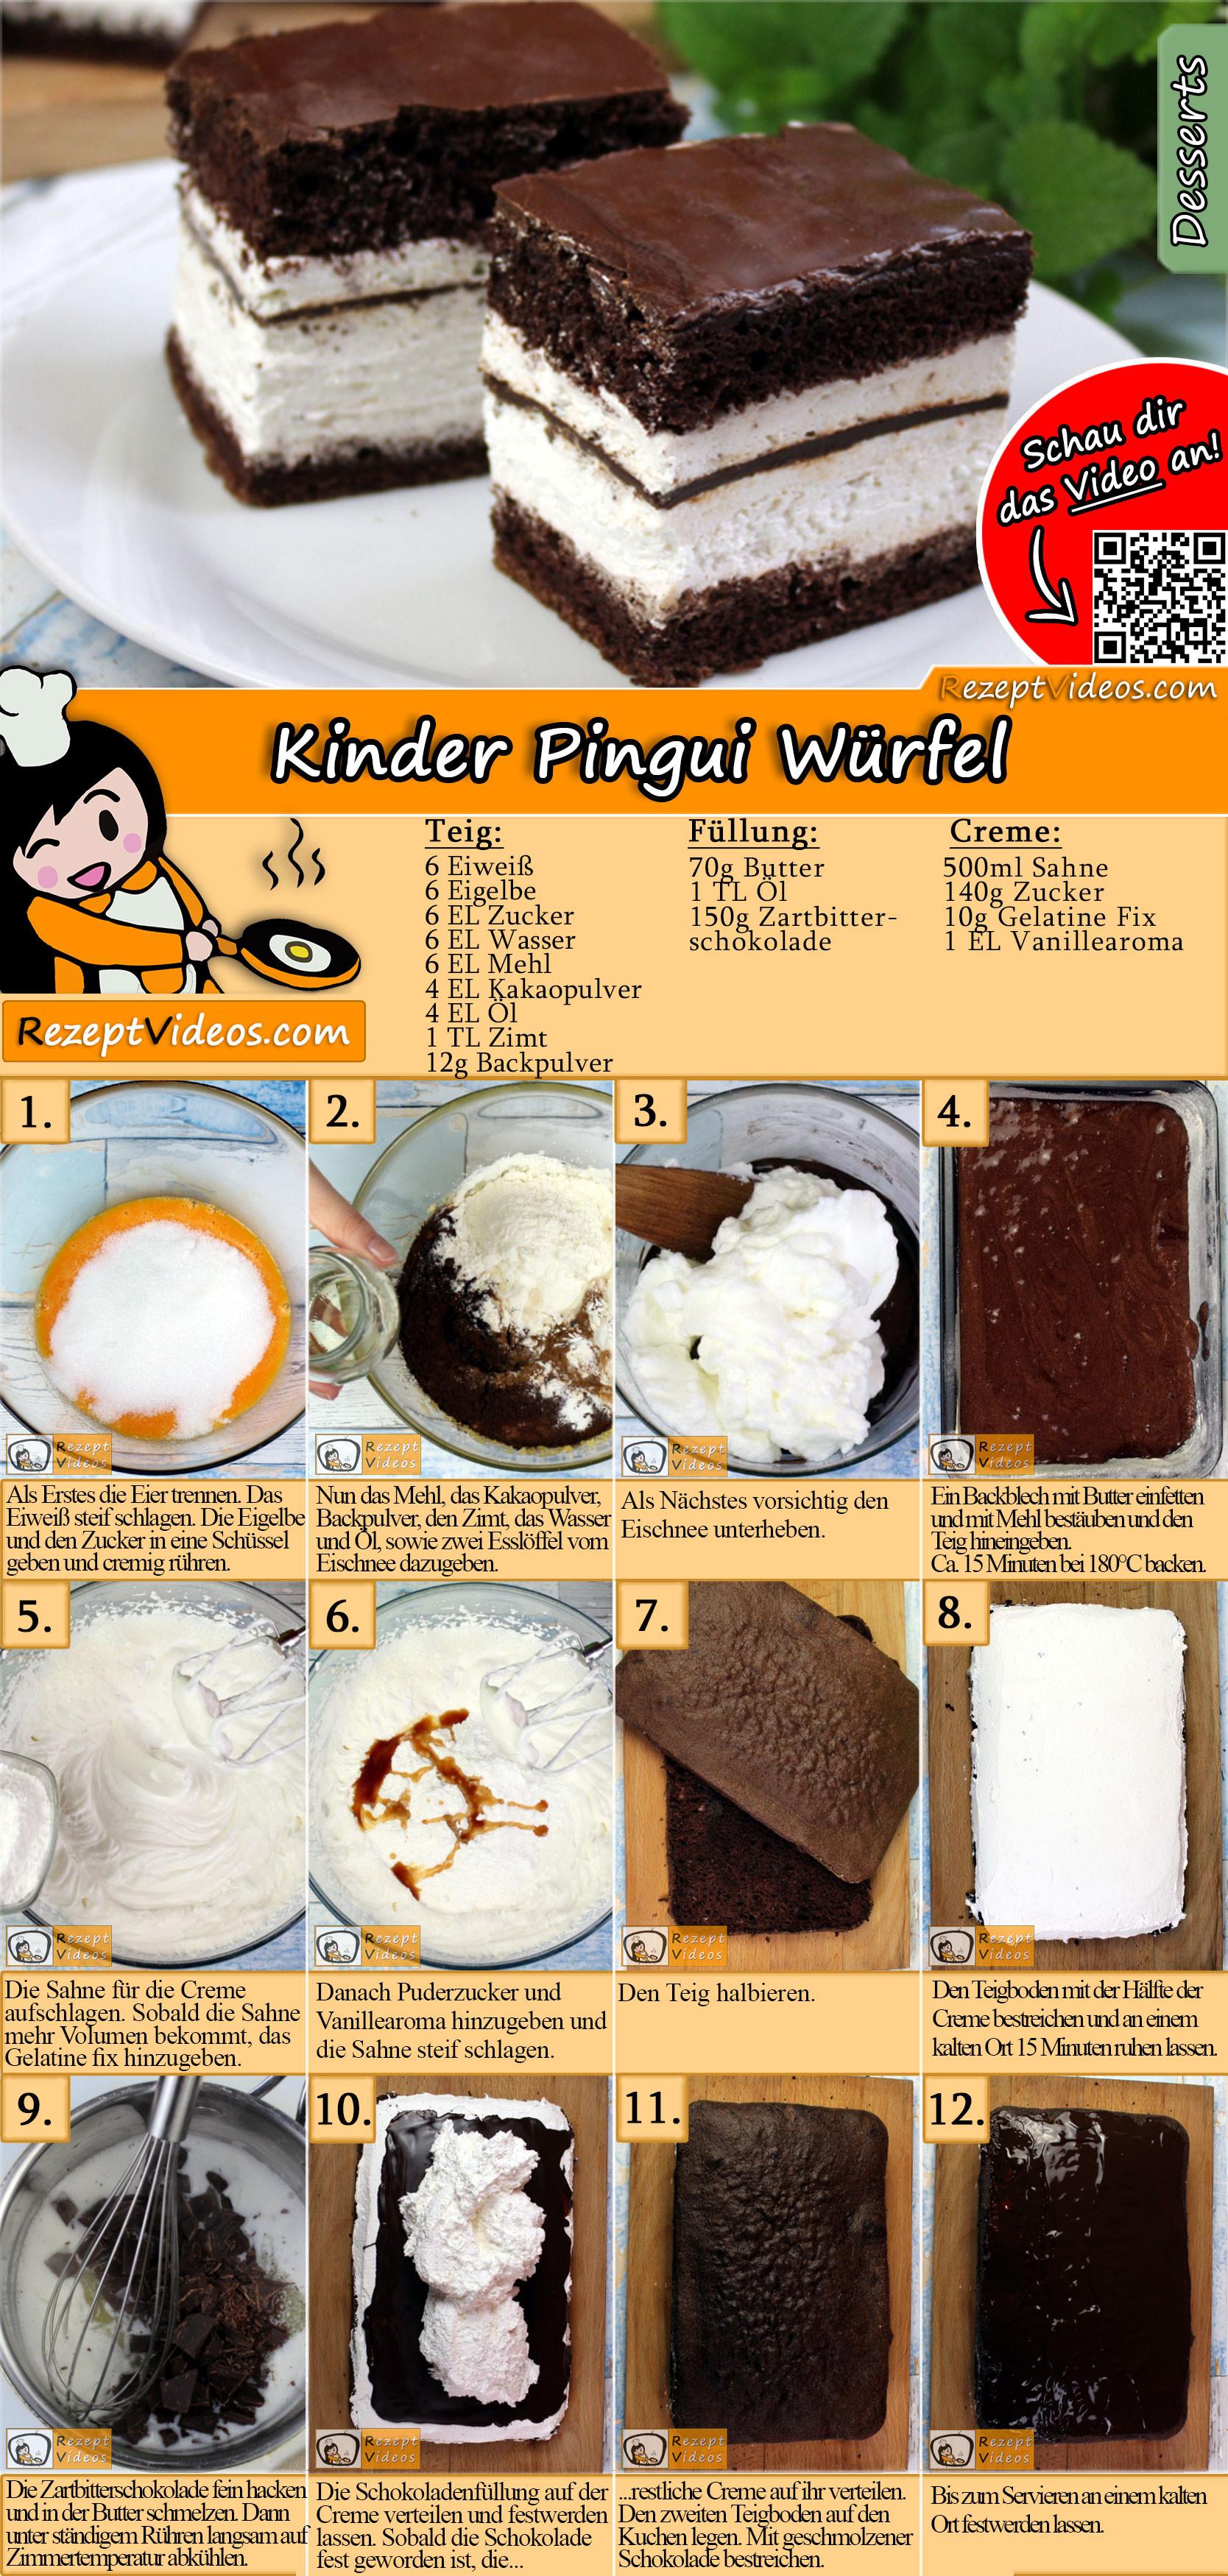 Kinder Pingui Würfel Rezept mit Video